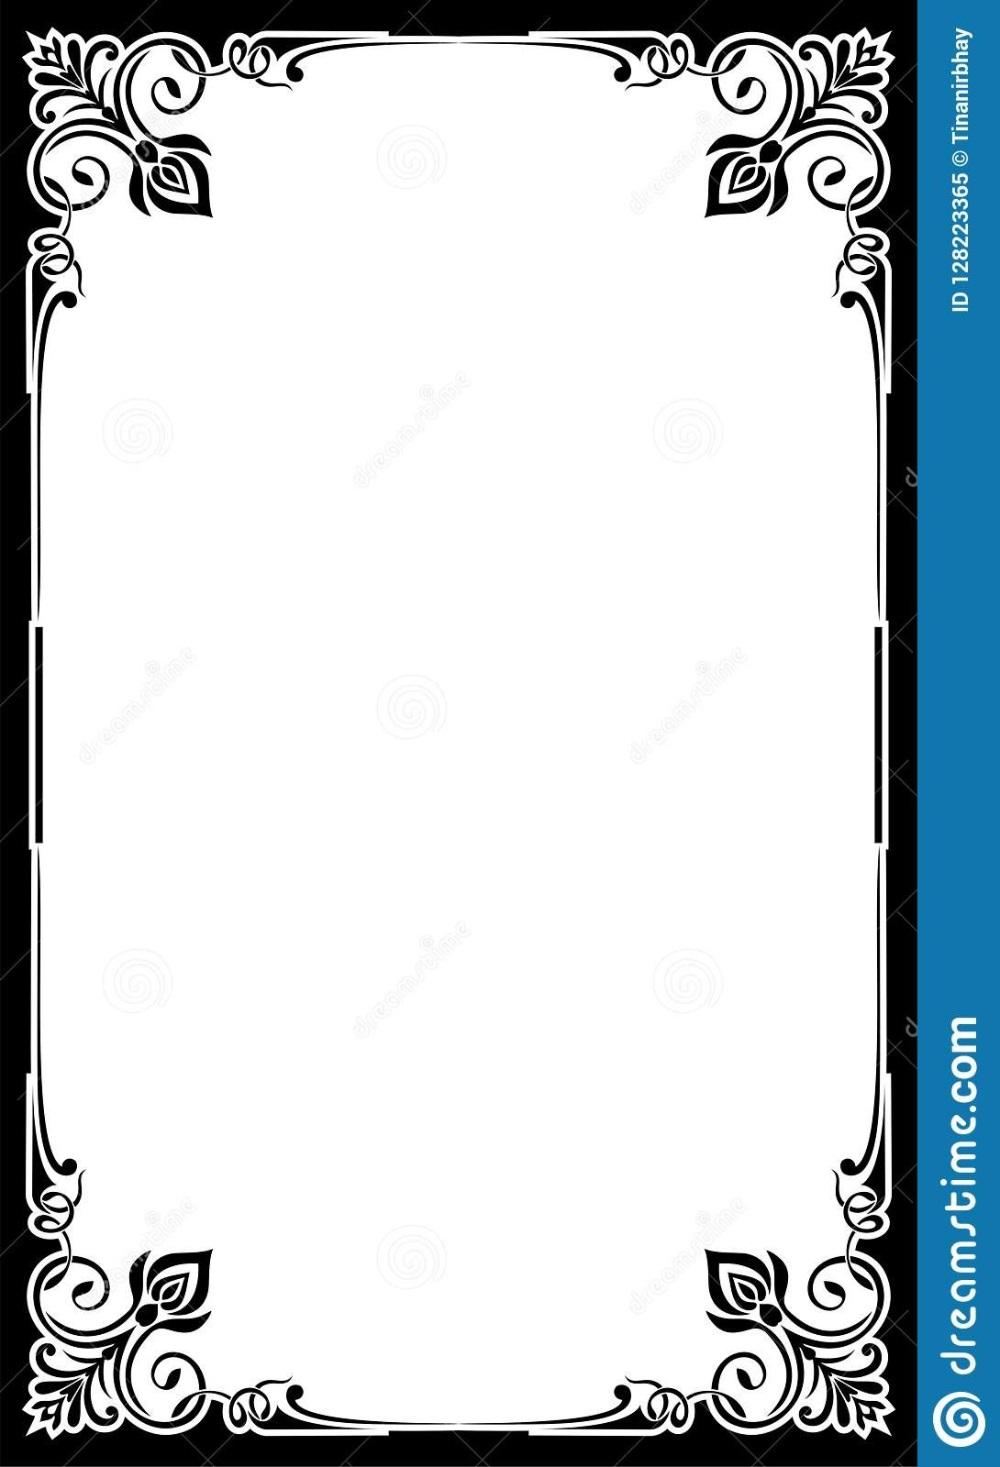 004 Incredible Blank Restaurant Menu Template Picture  Free Printable DownloadableFull